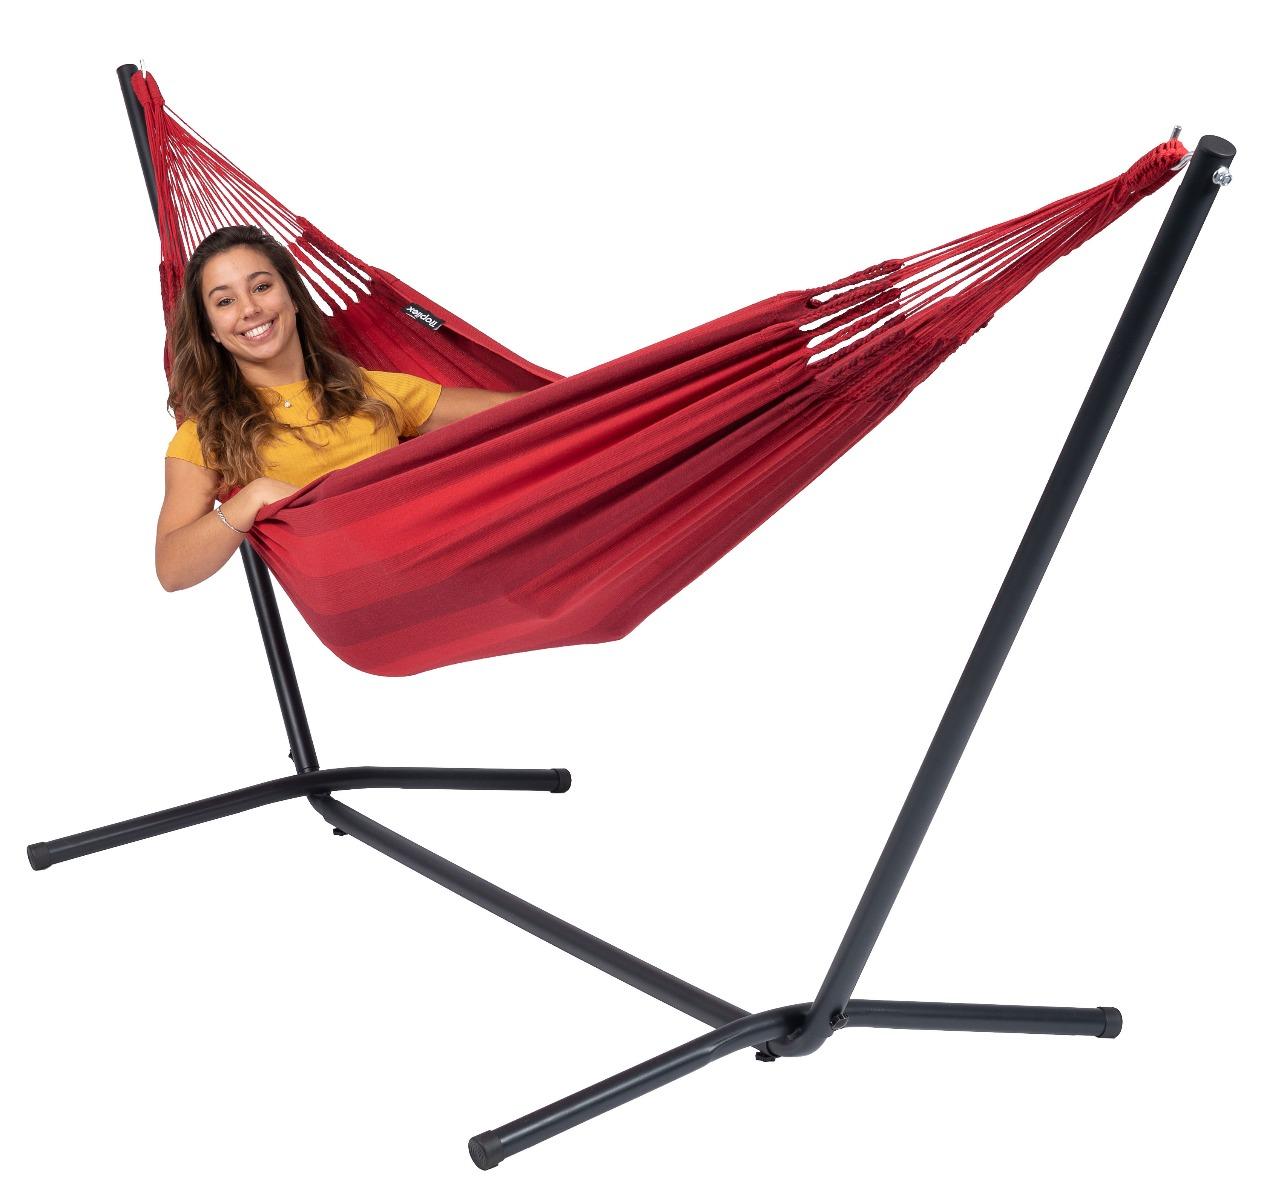 Hangmat met Standaard E�npersoons 'Easy & Dream' Red - Rood - Tropilex �